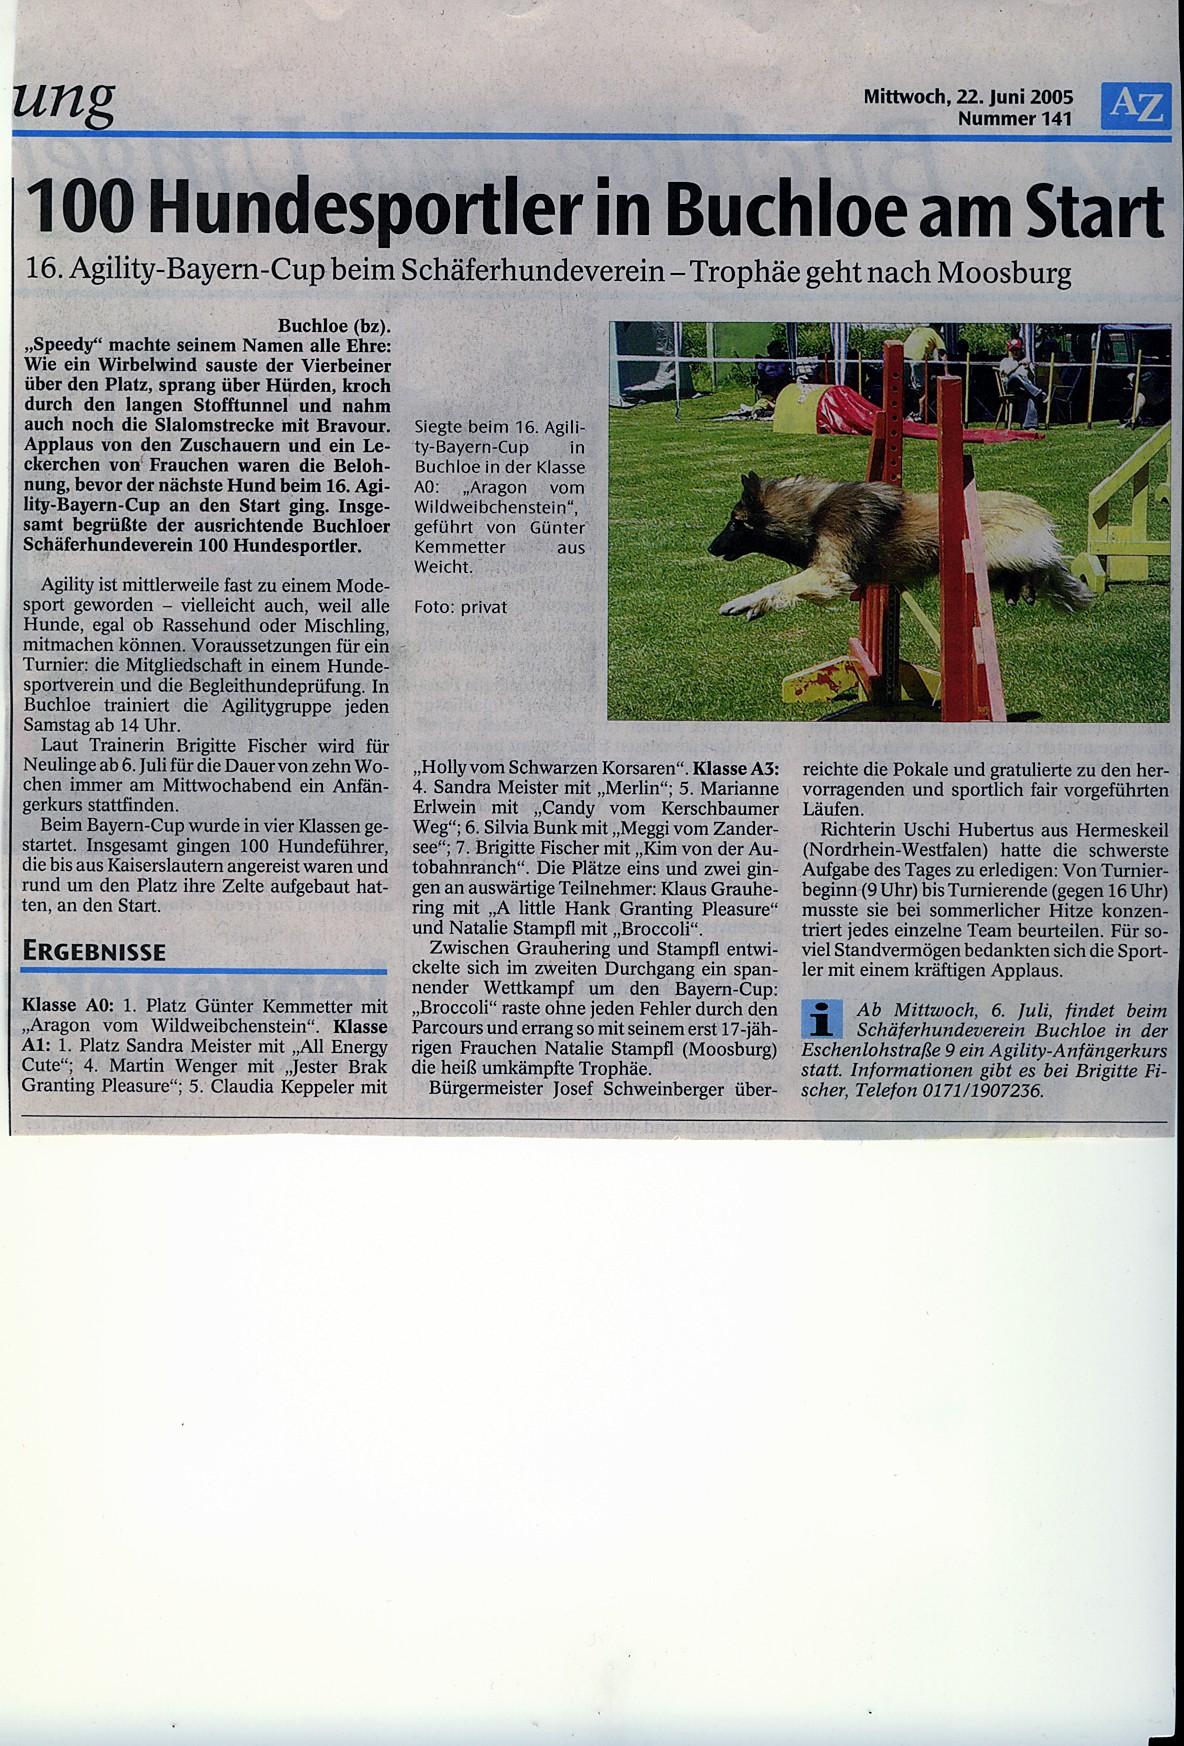 bayern-cup-2005_2.jpg